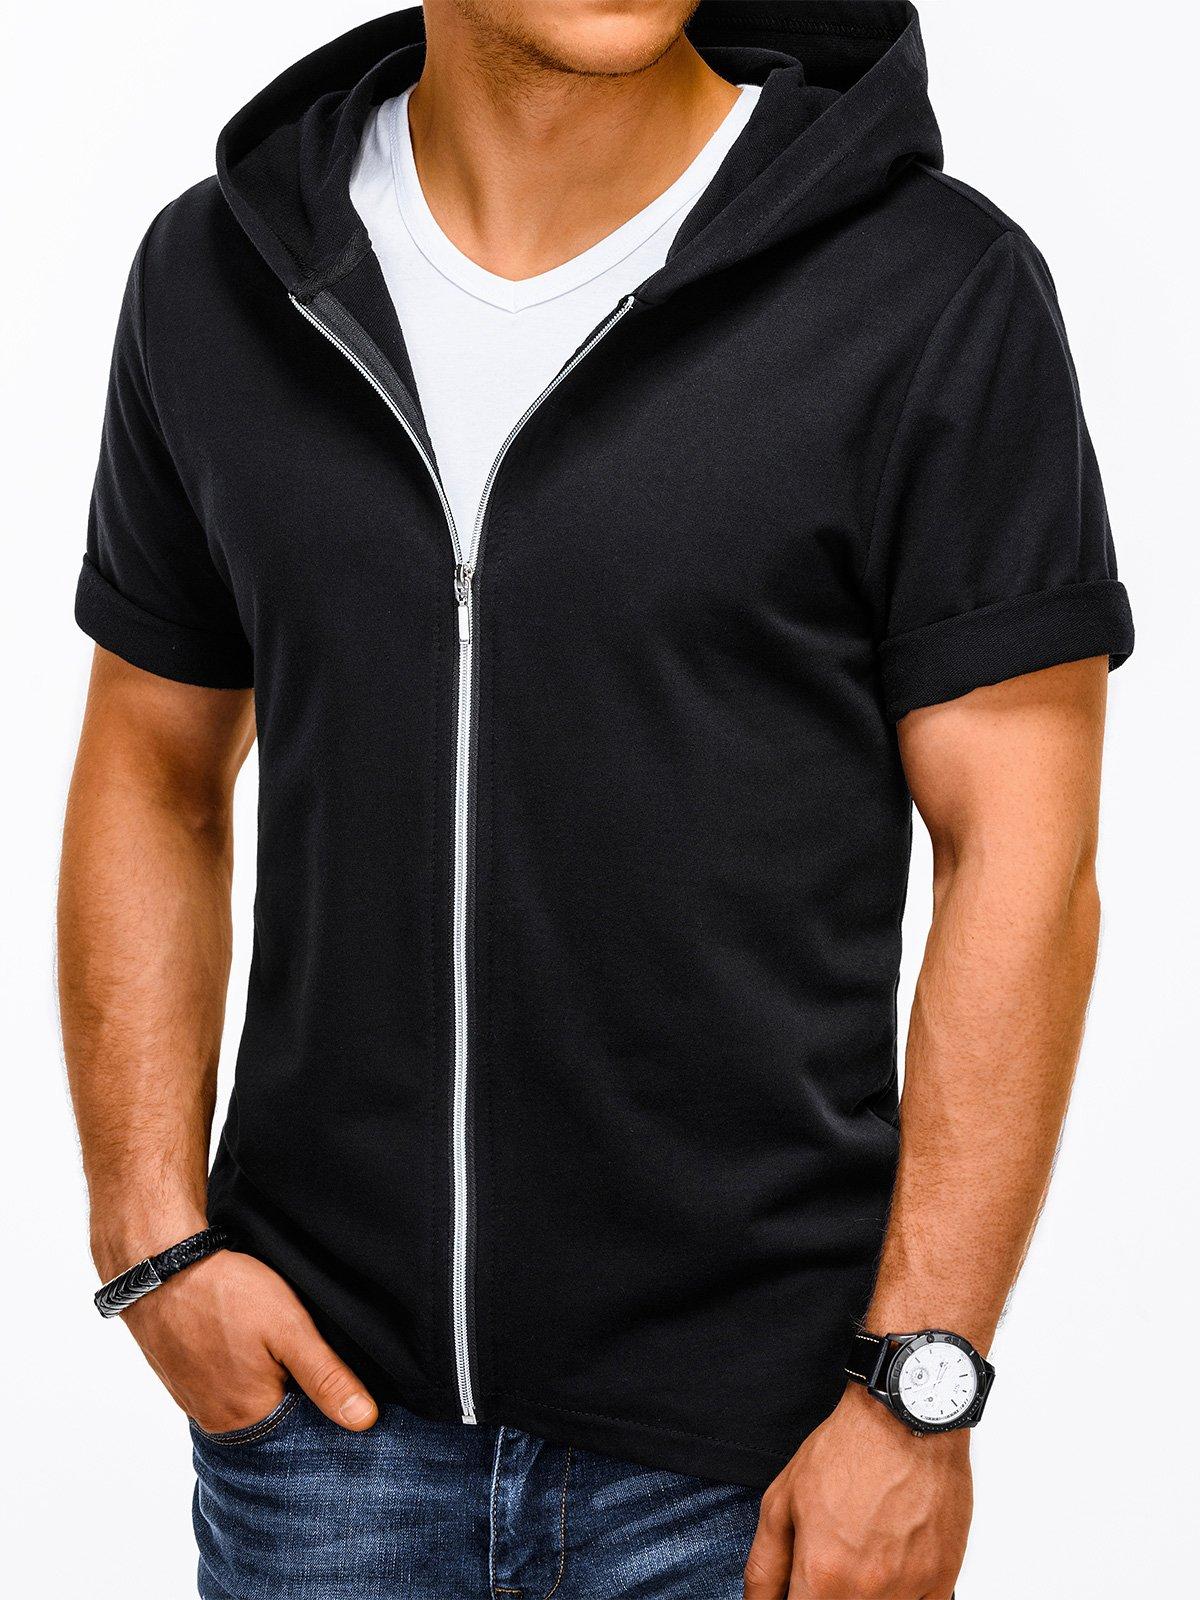 Ombre Clothing pánska mikina s krátkymi rukávmi B960